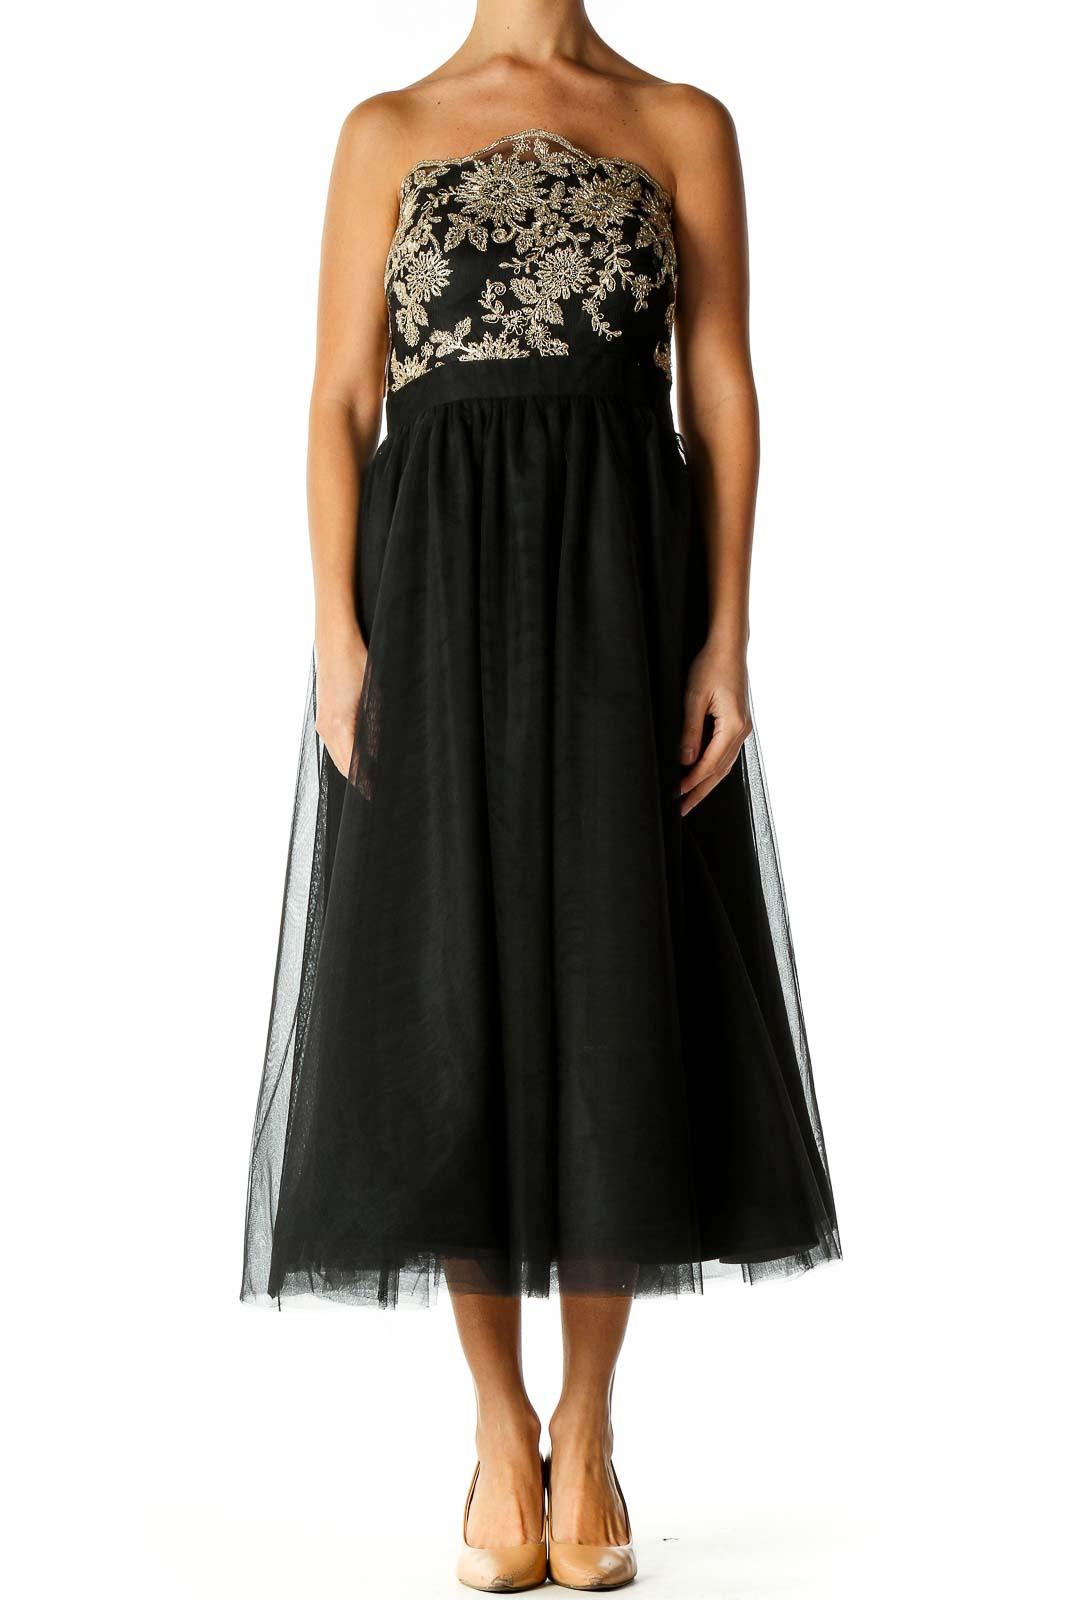 Black Chic Semiformal Dress Front